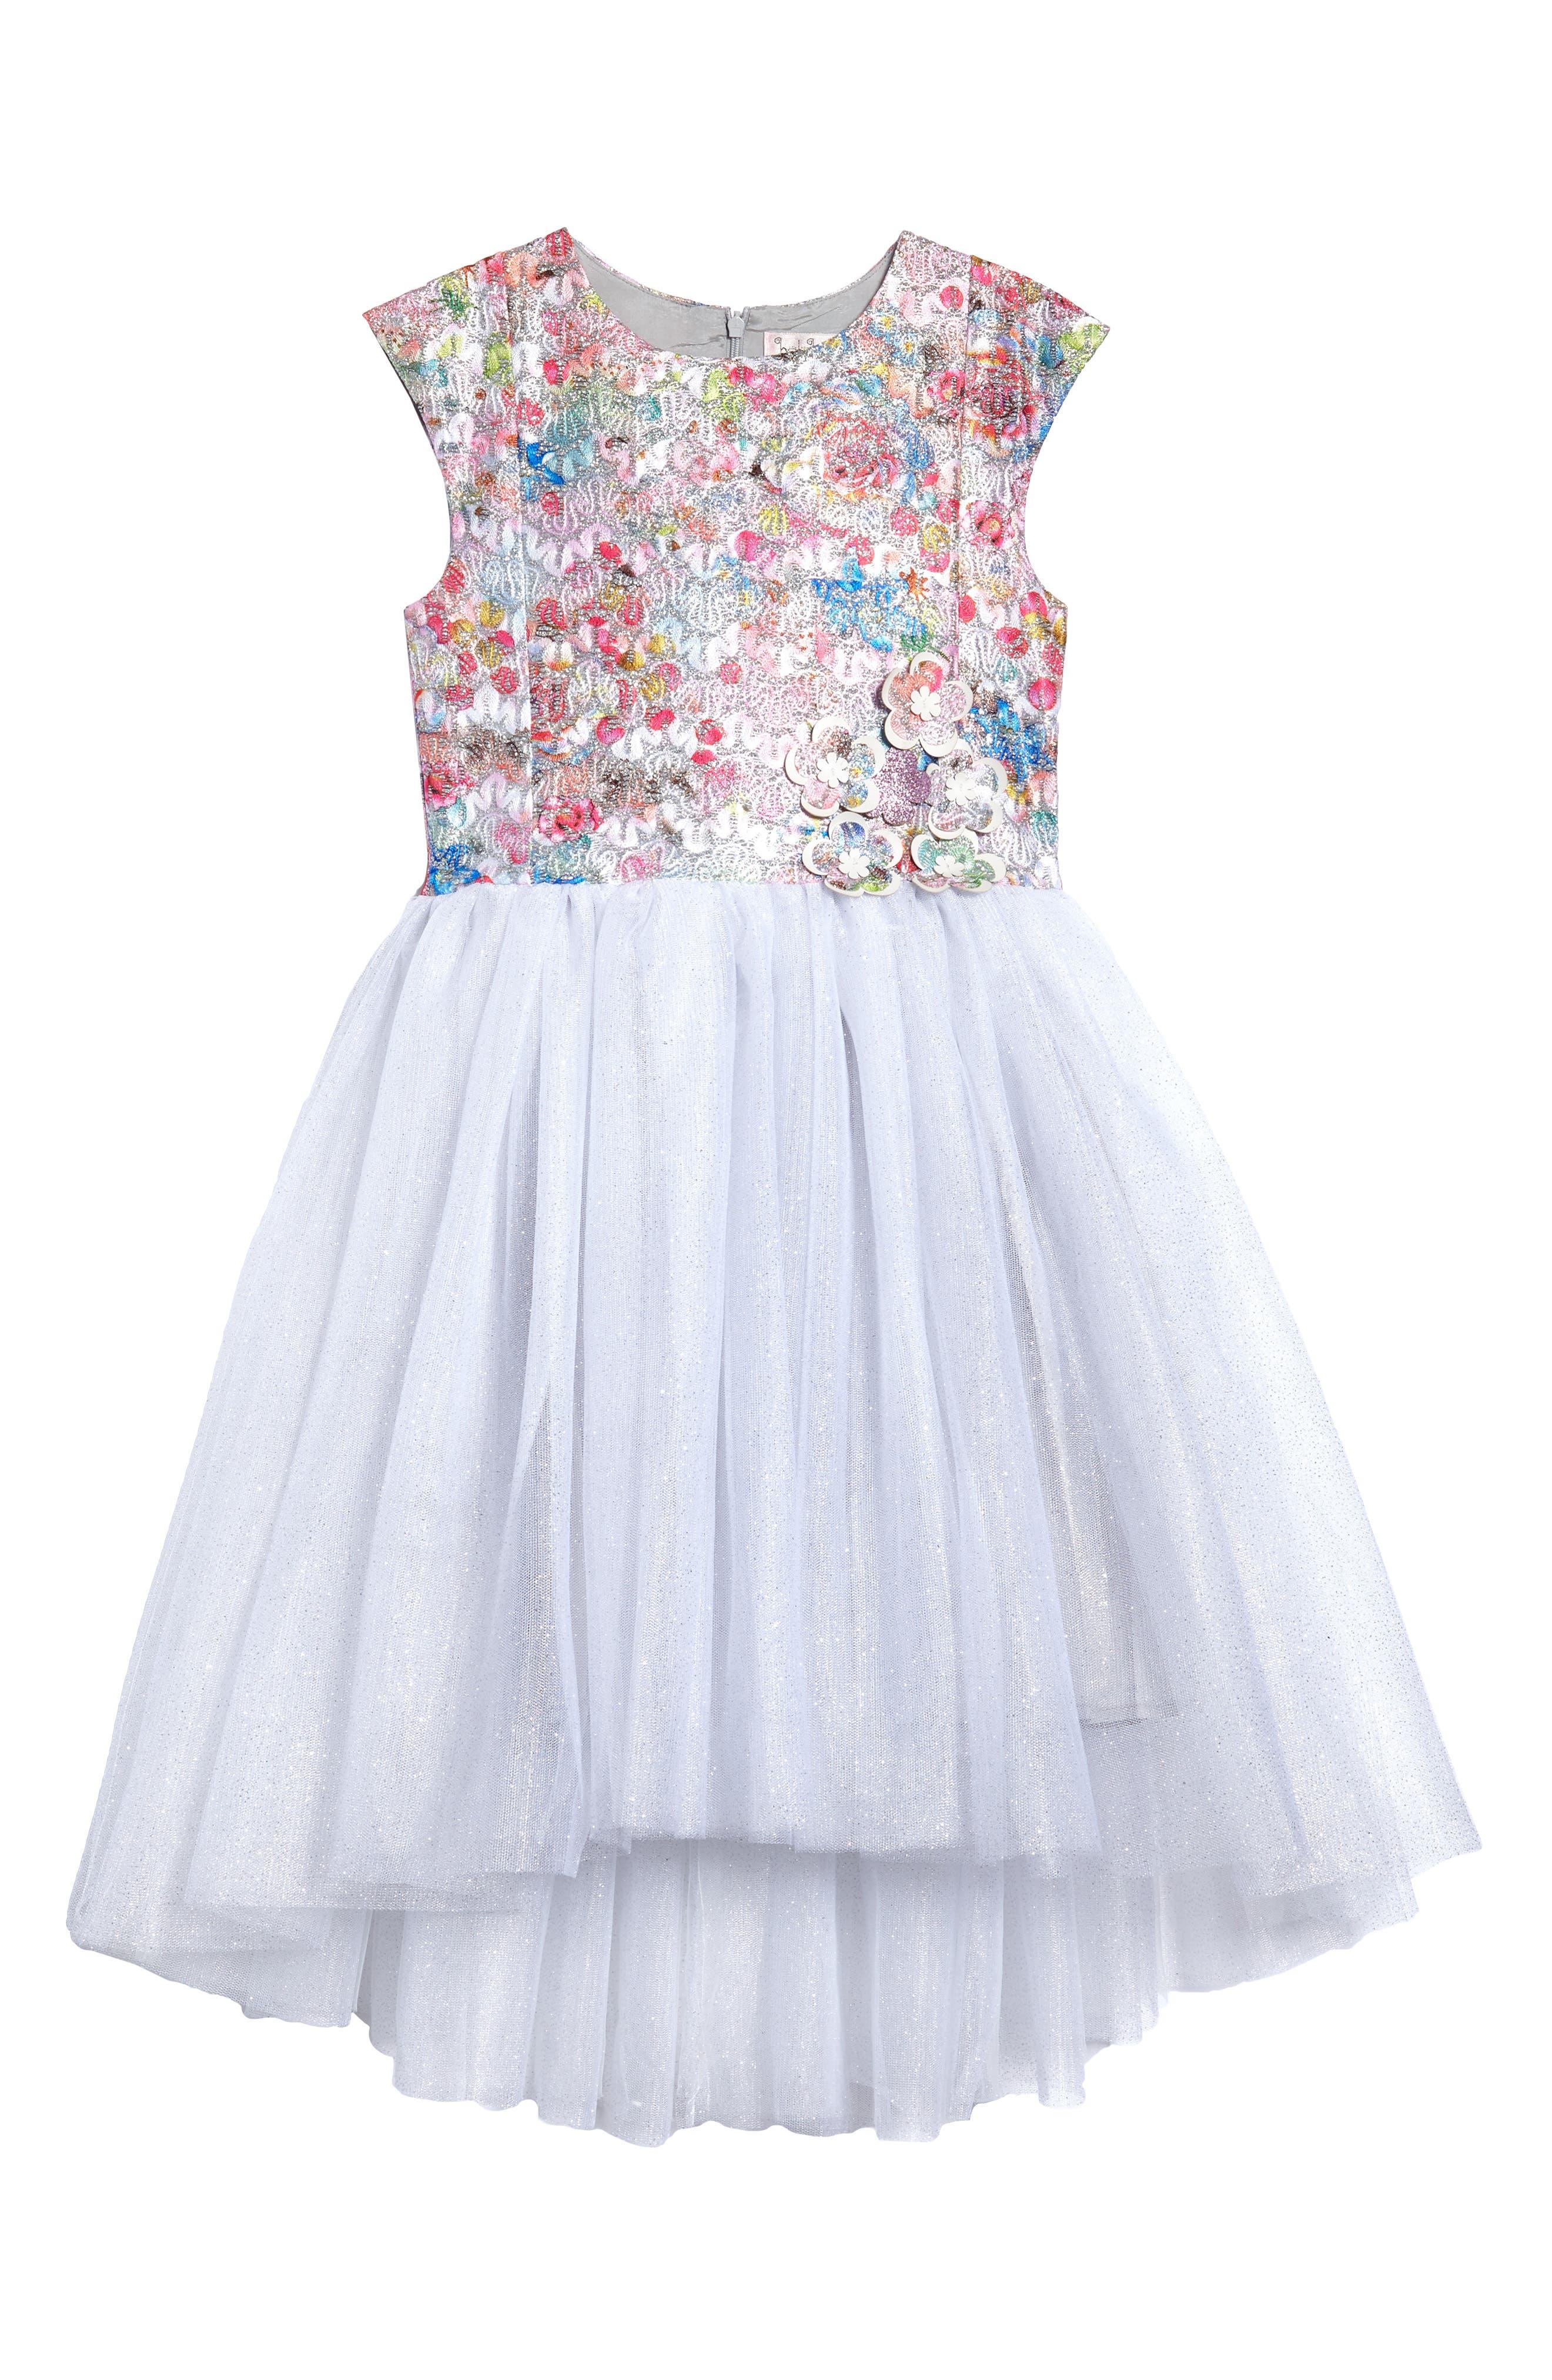 Halabaloo Brocade Bodice Dress (Toddler Girls, Little Girls & Big Girls)